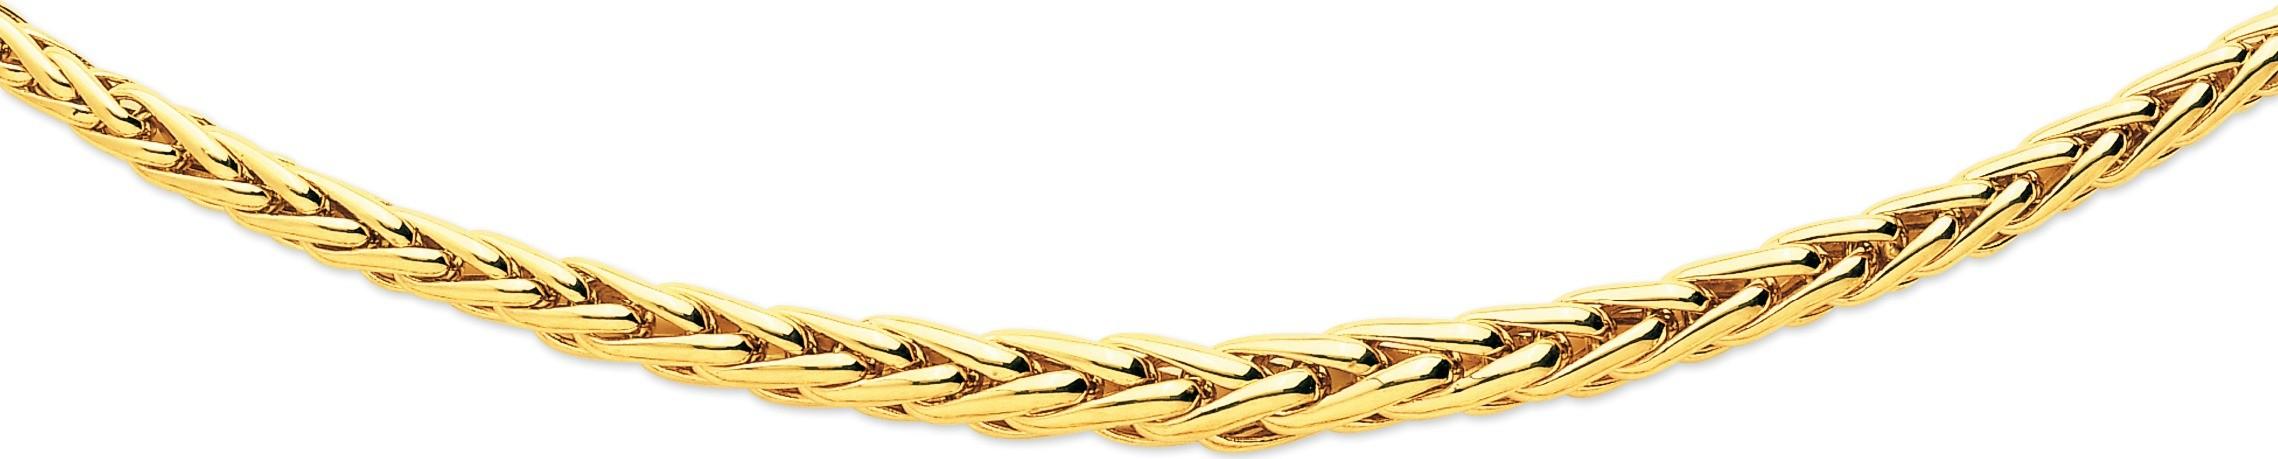 bijoux or-collier maille palmier 161007